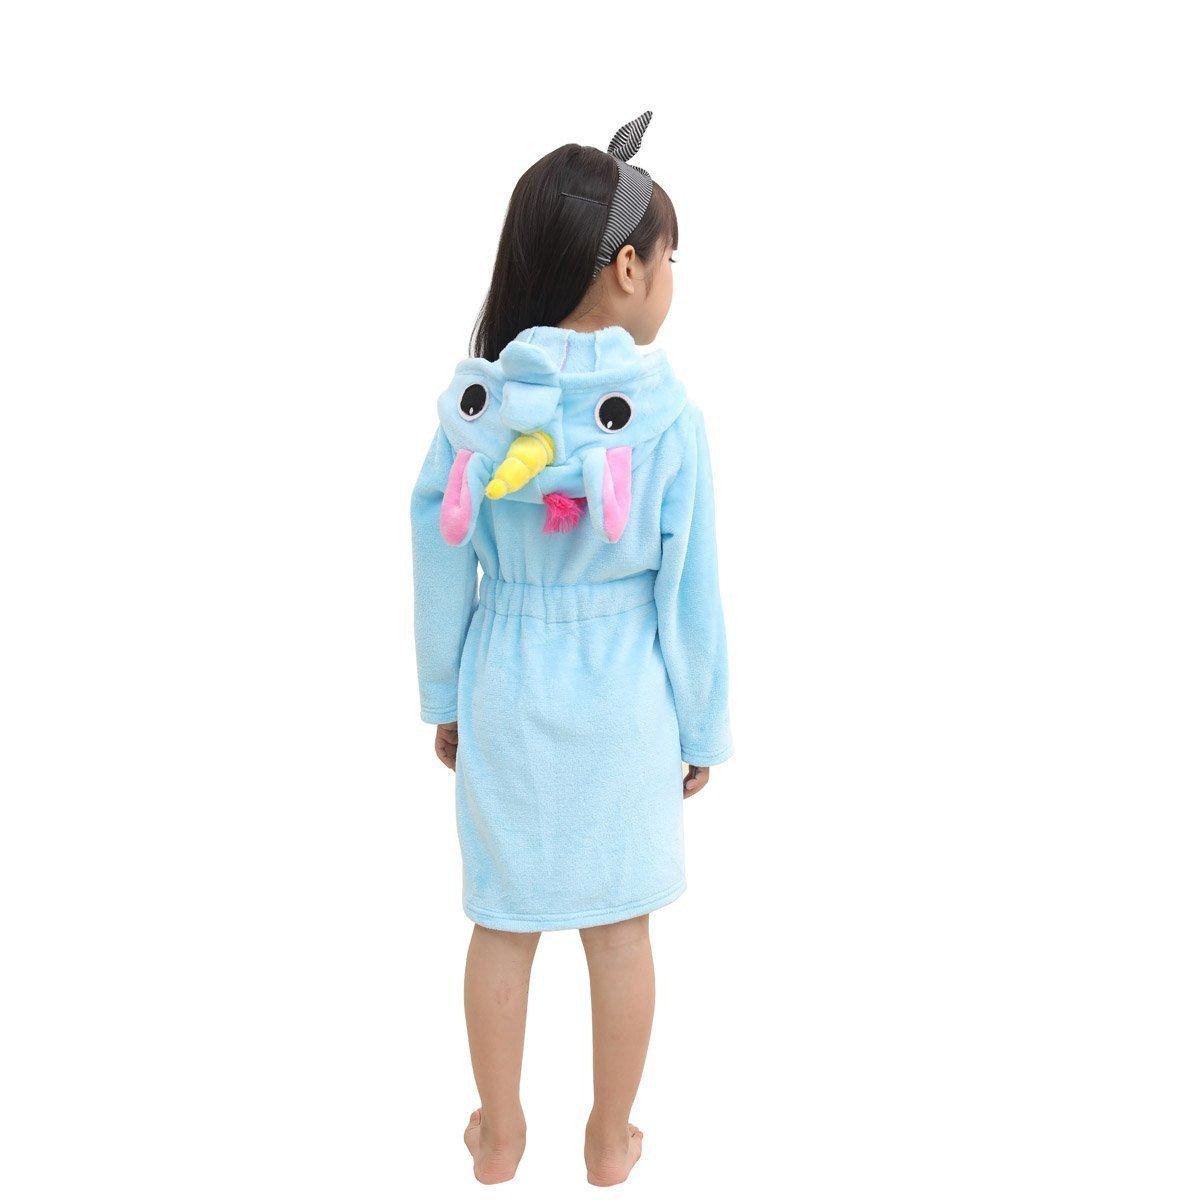 RGTOPONE Kids Soft Bathrobe Unicorn Fleece